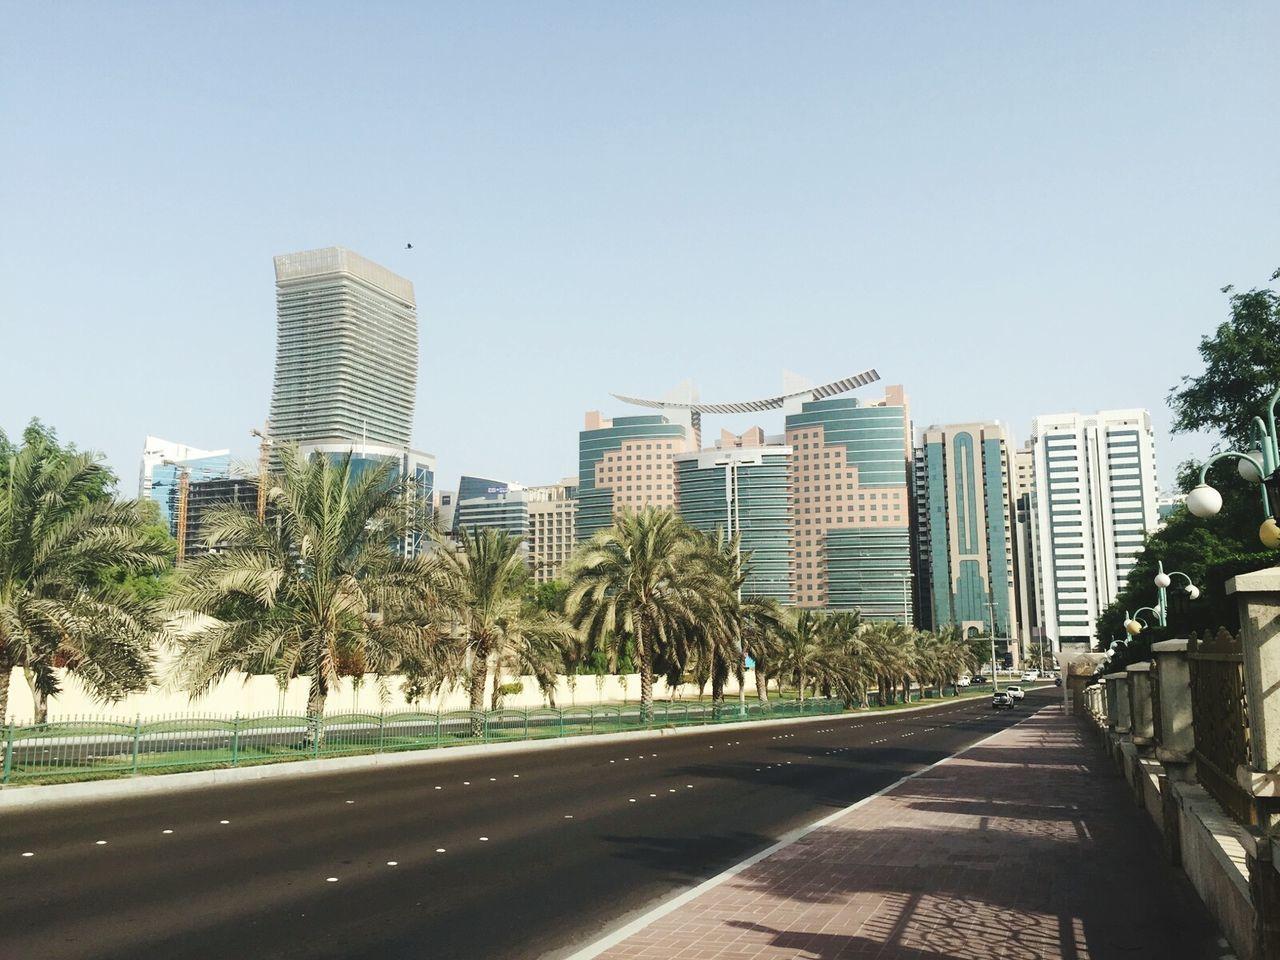 Empty Road Leading Towards Buildings In City